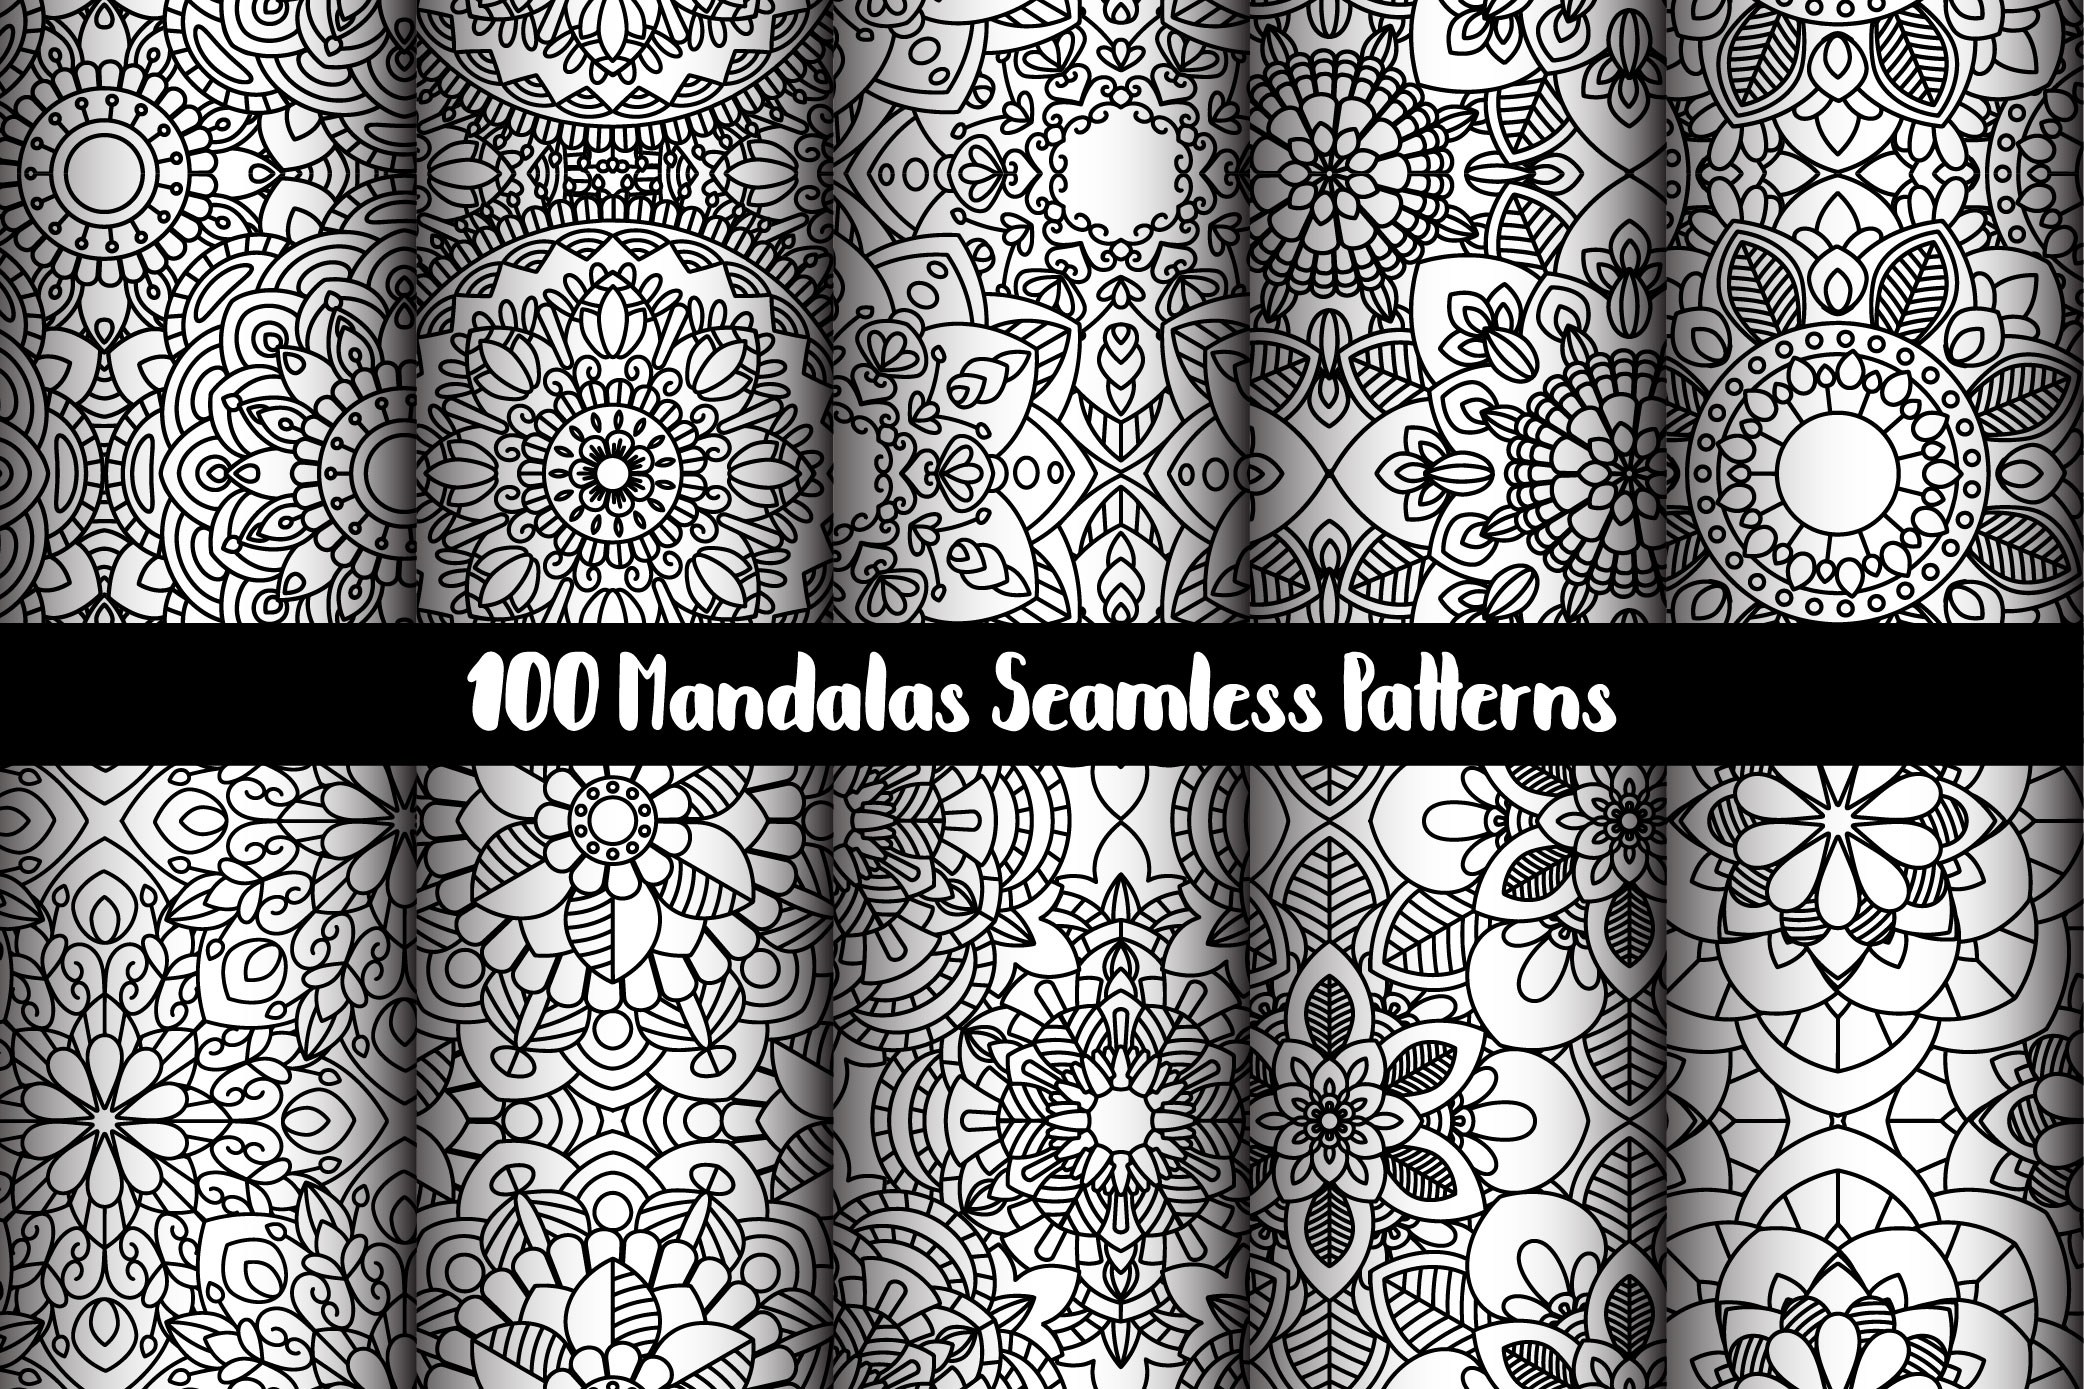 100 Mandalas Seamless Patterns example image 9